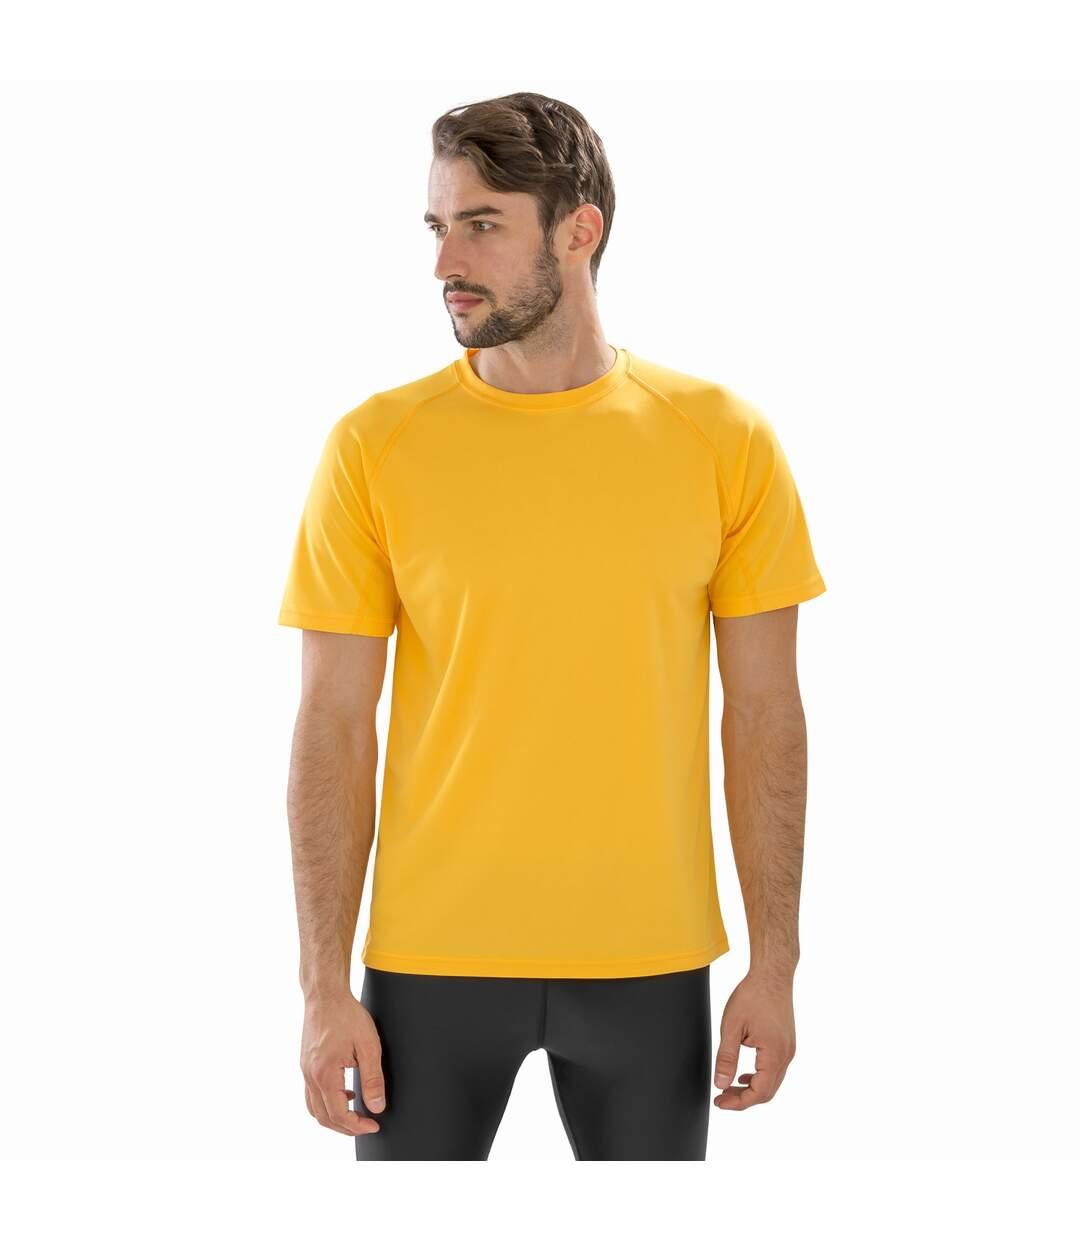 Spiro Mens Impact Aircool T-Shirt (Gold) - UTBC4856